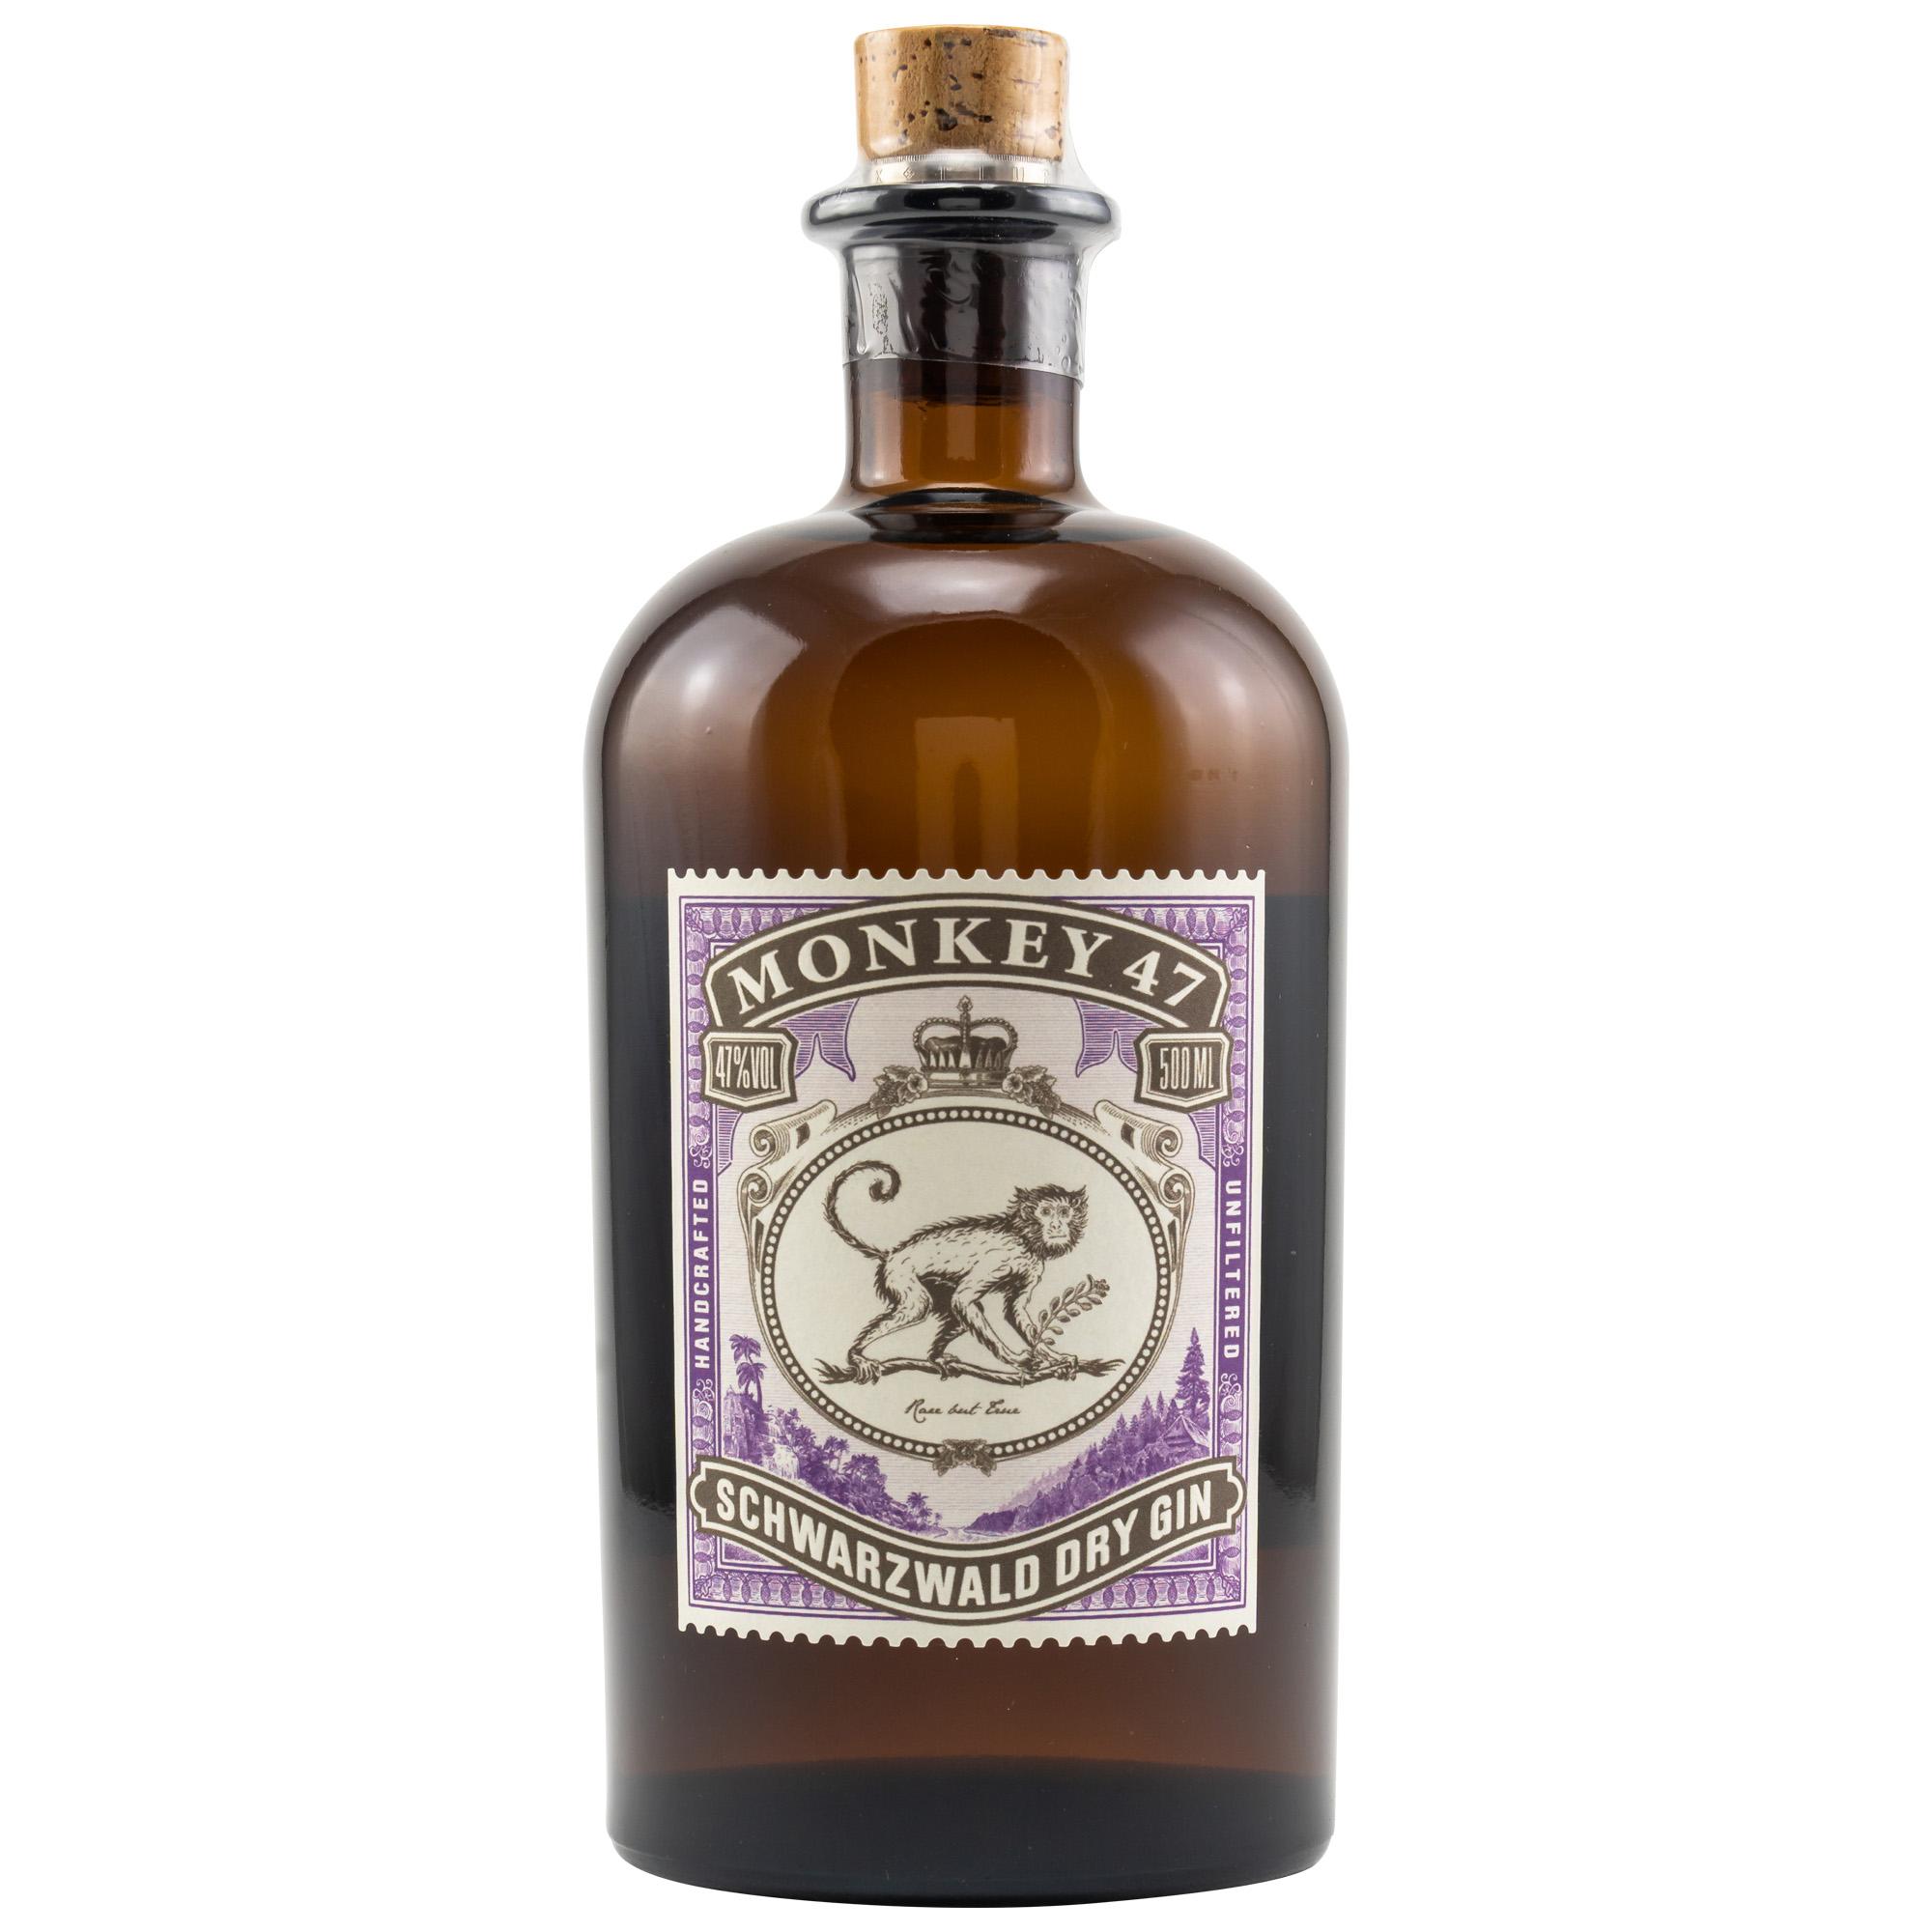 Monkey 47 Dry Gin 47% - 0,5l.